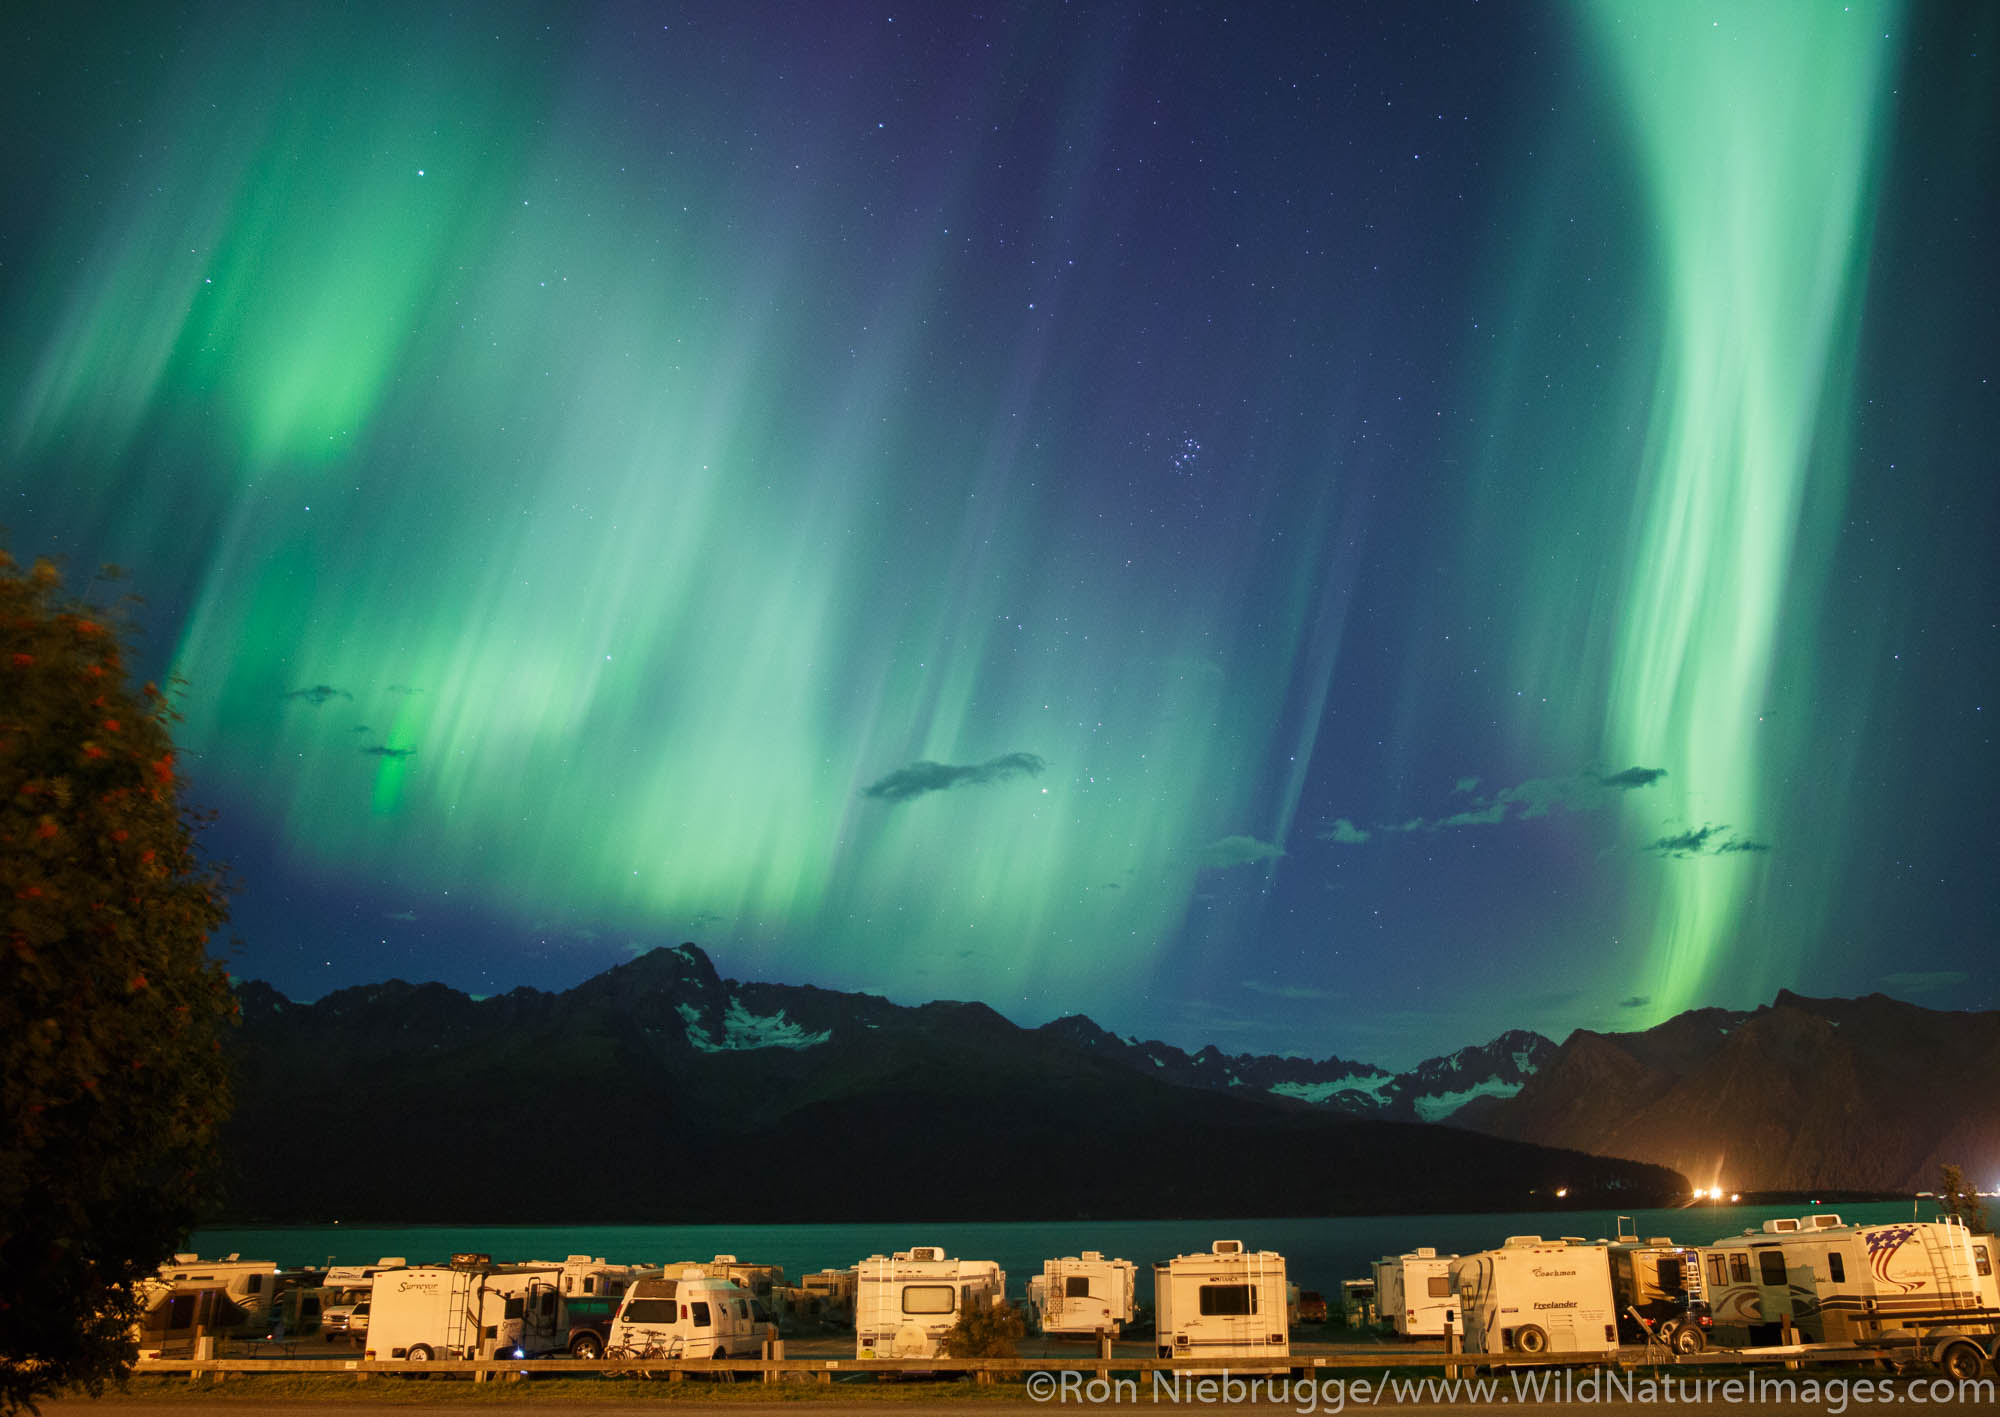 Northern lights dance above the town of Seward, Alaska.